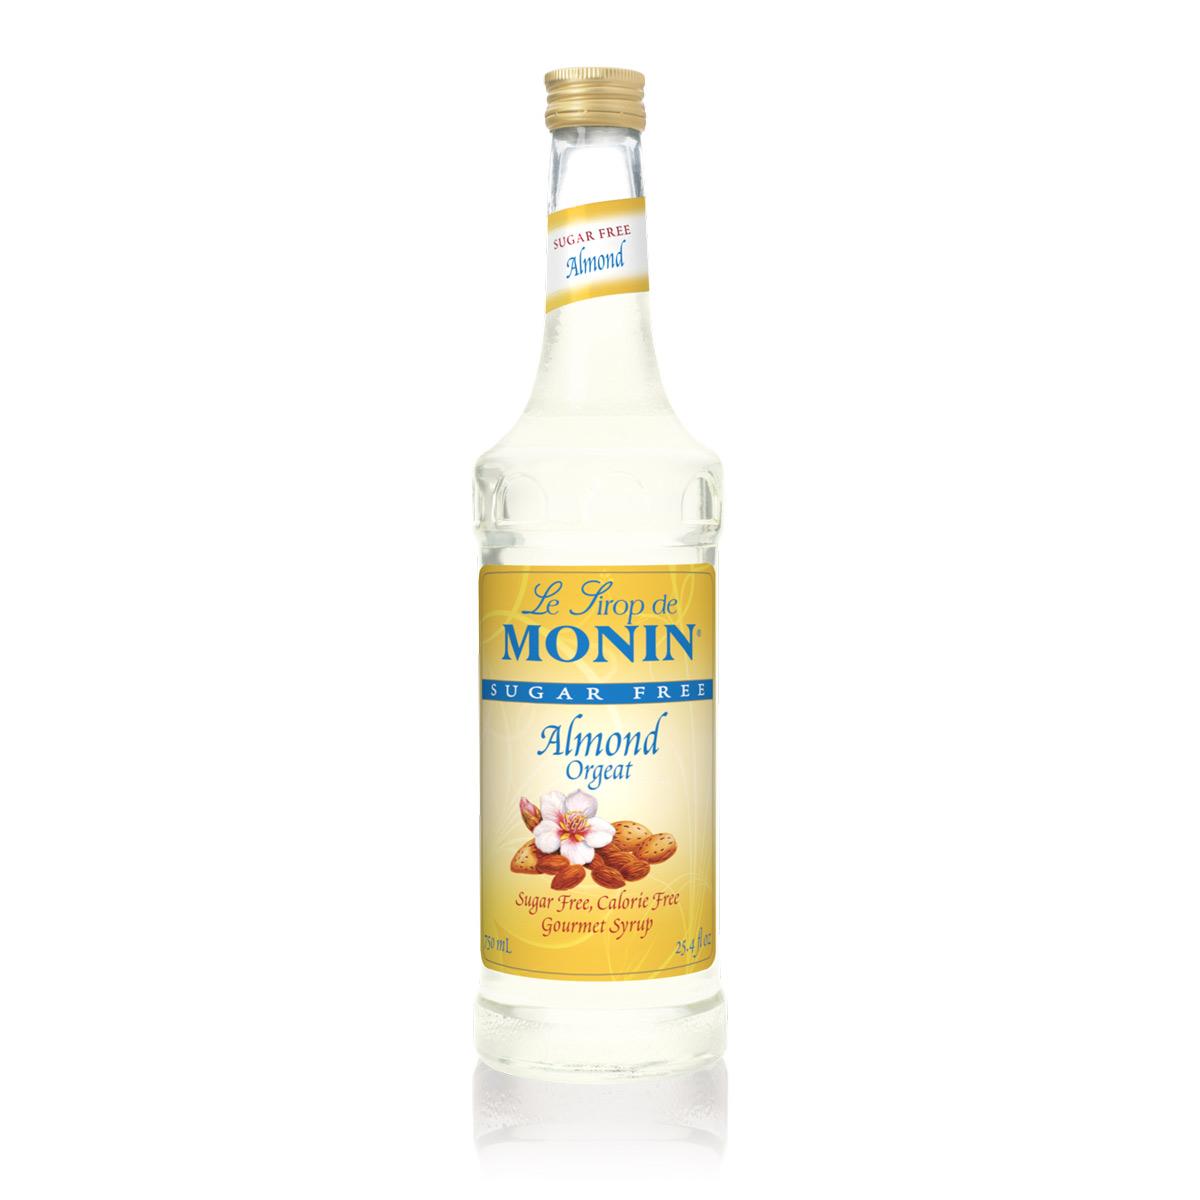 Monin Sugar Free Almond Syrup - 750ml Bottle